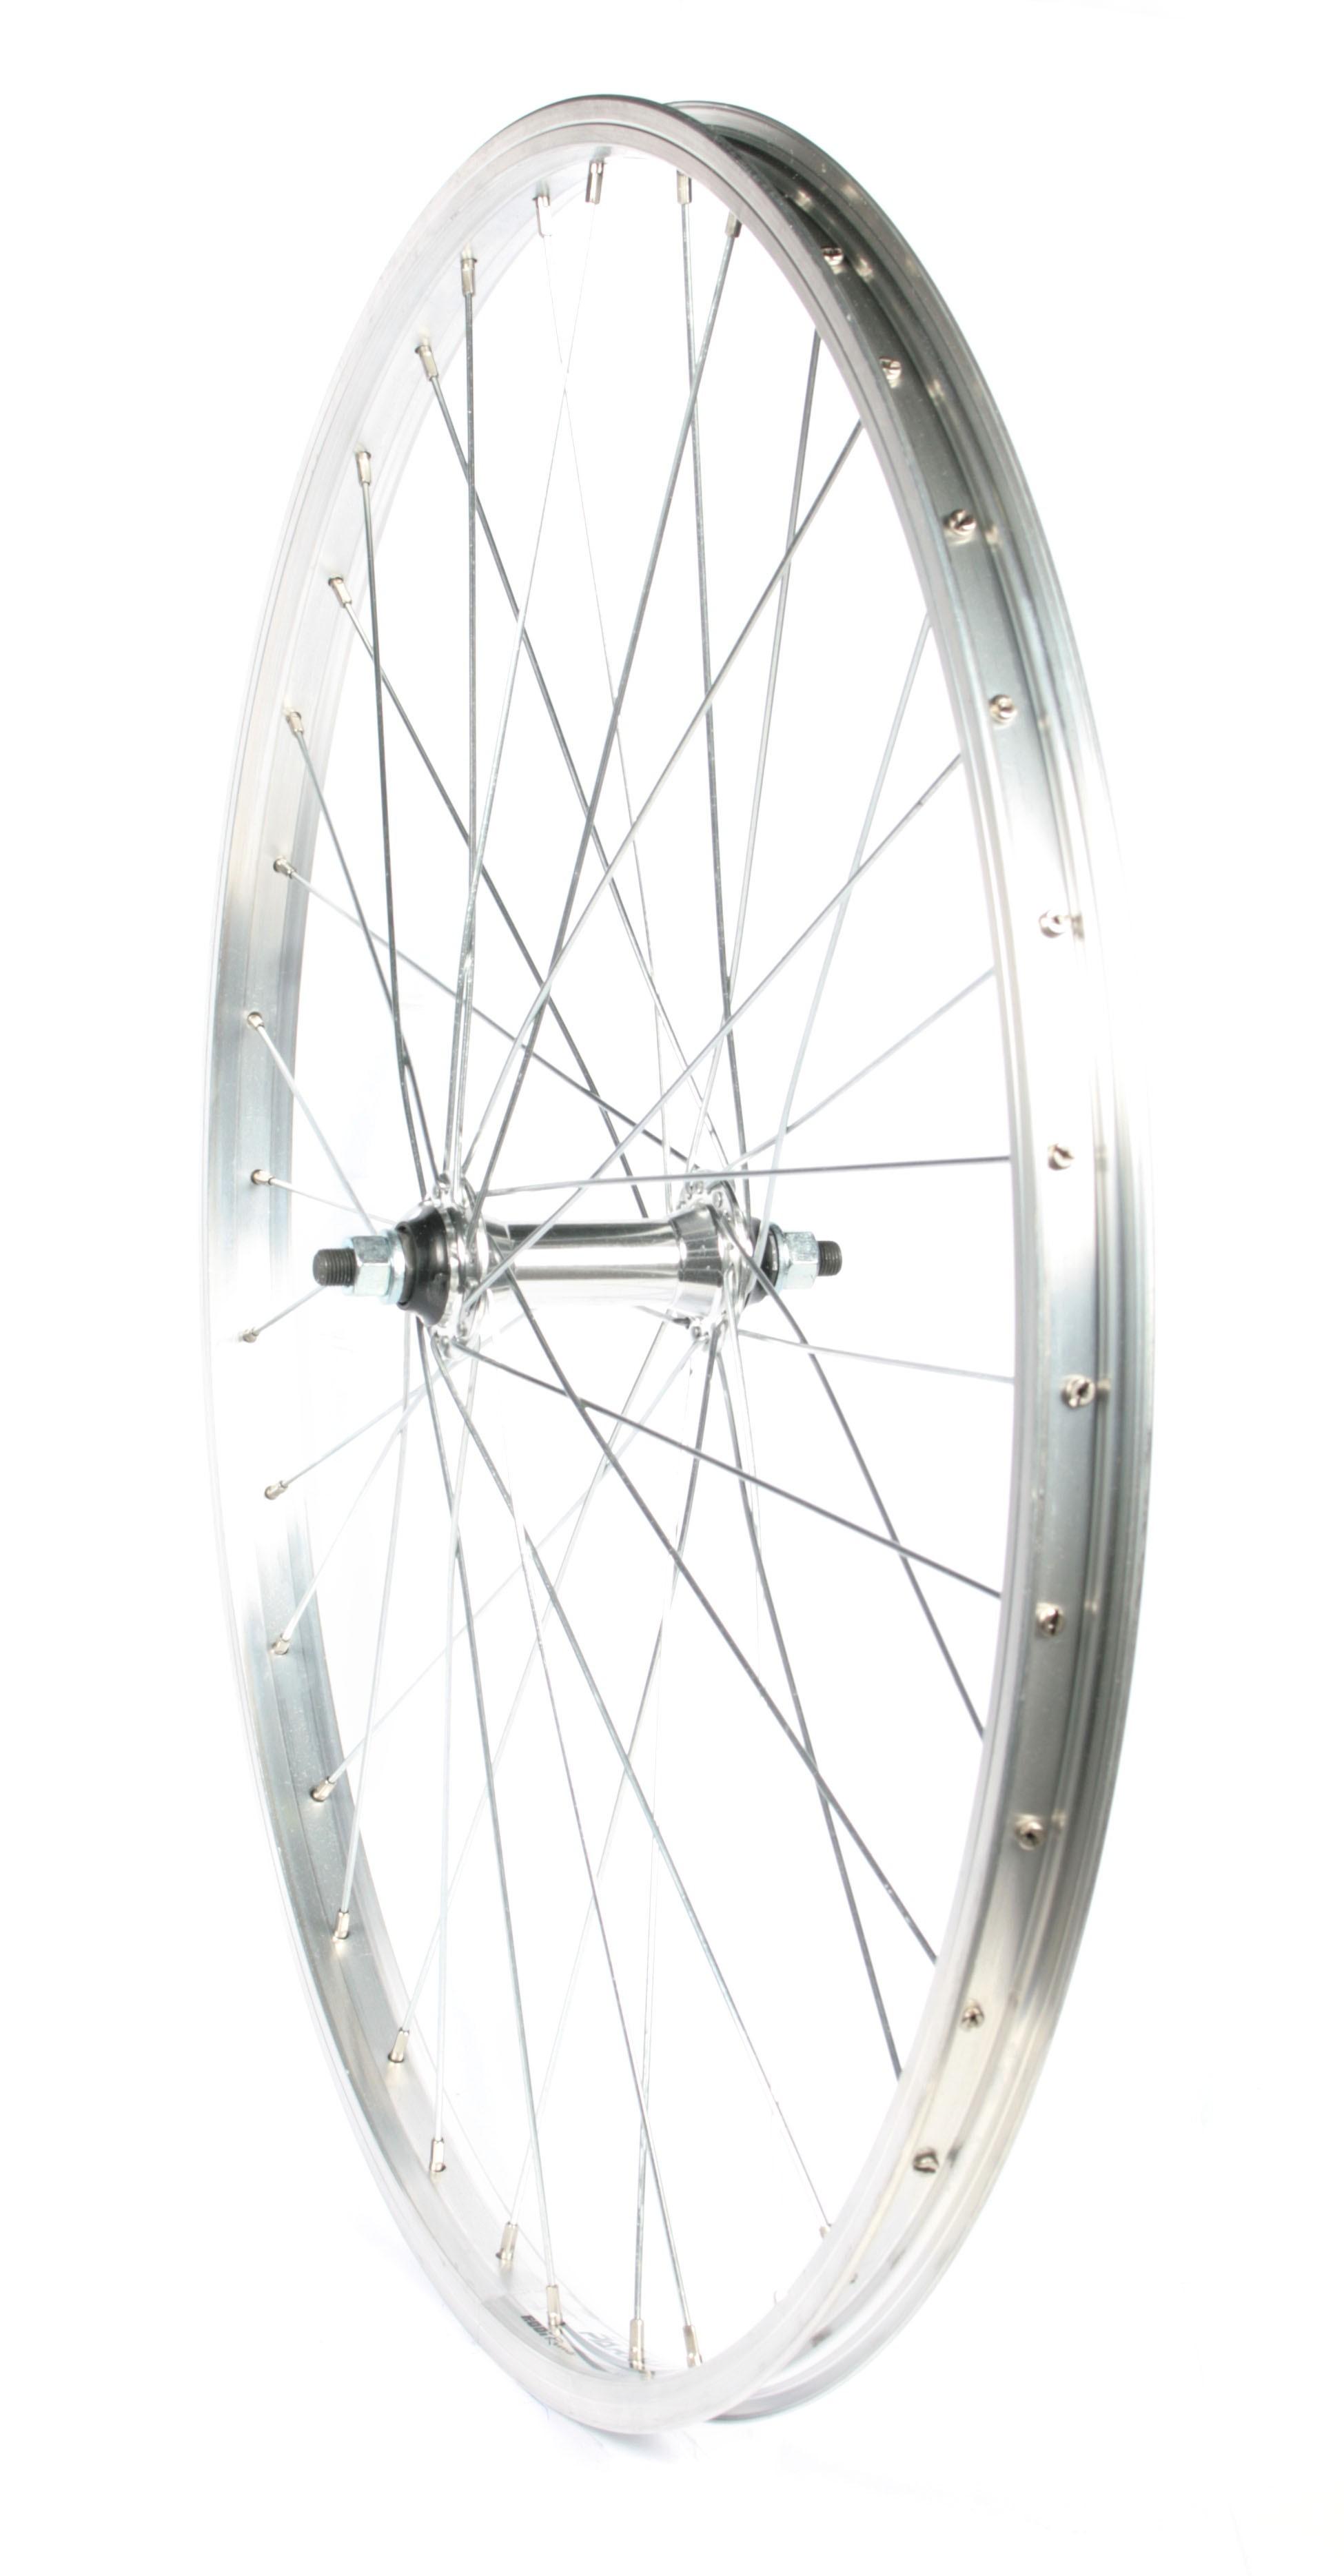 Bike Original Roue avant vtt écrou